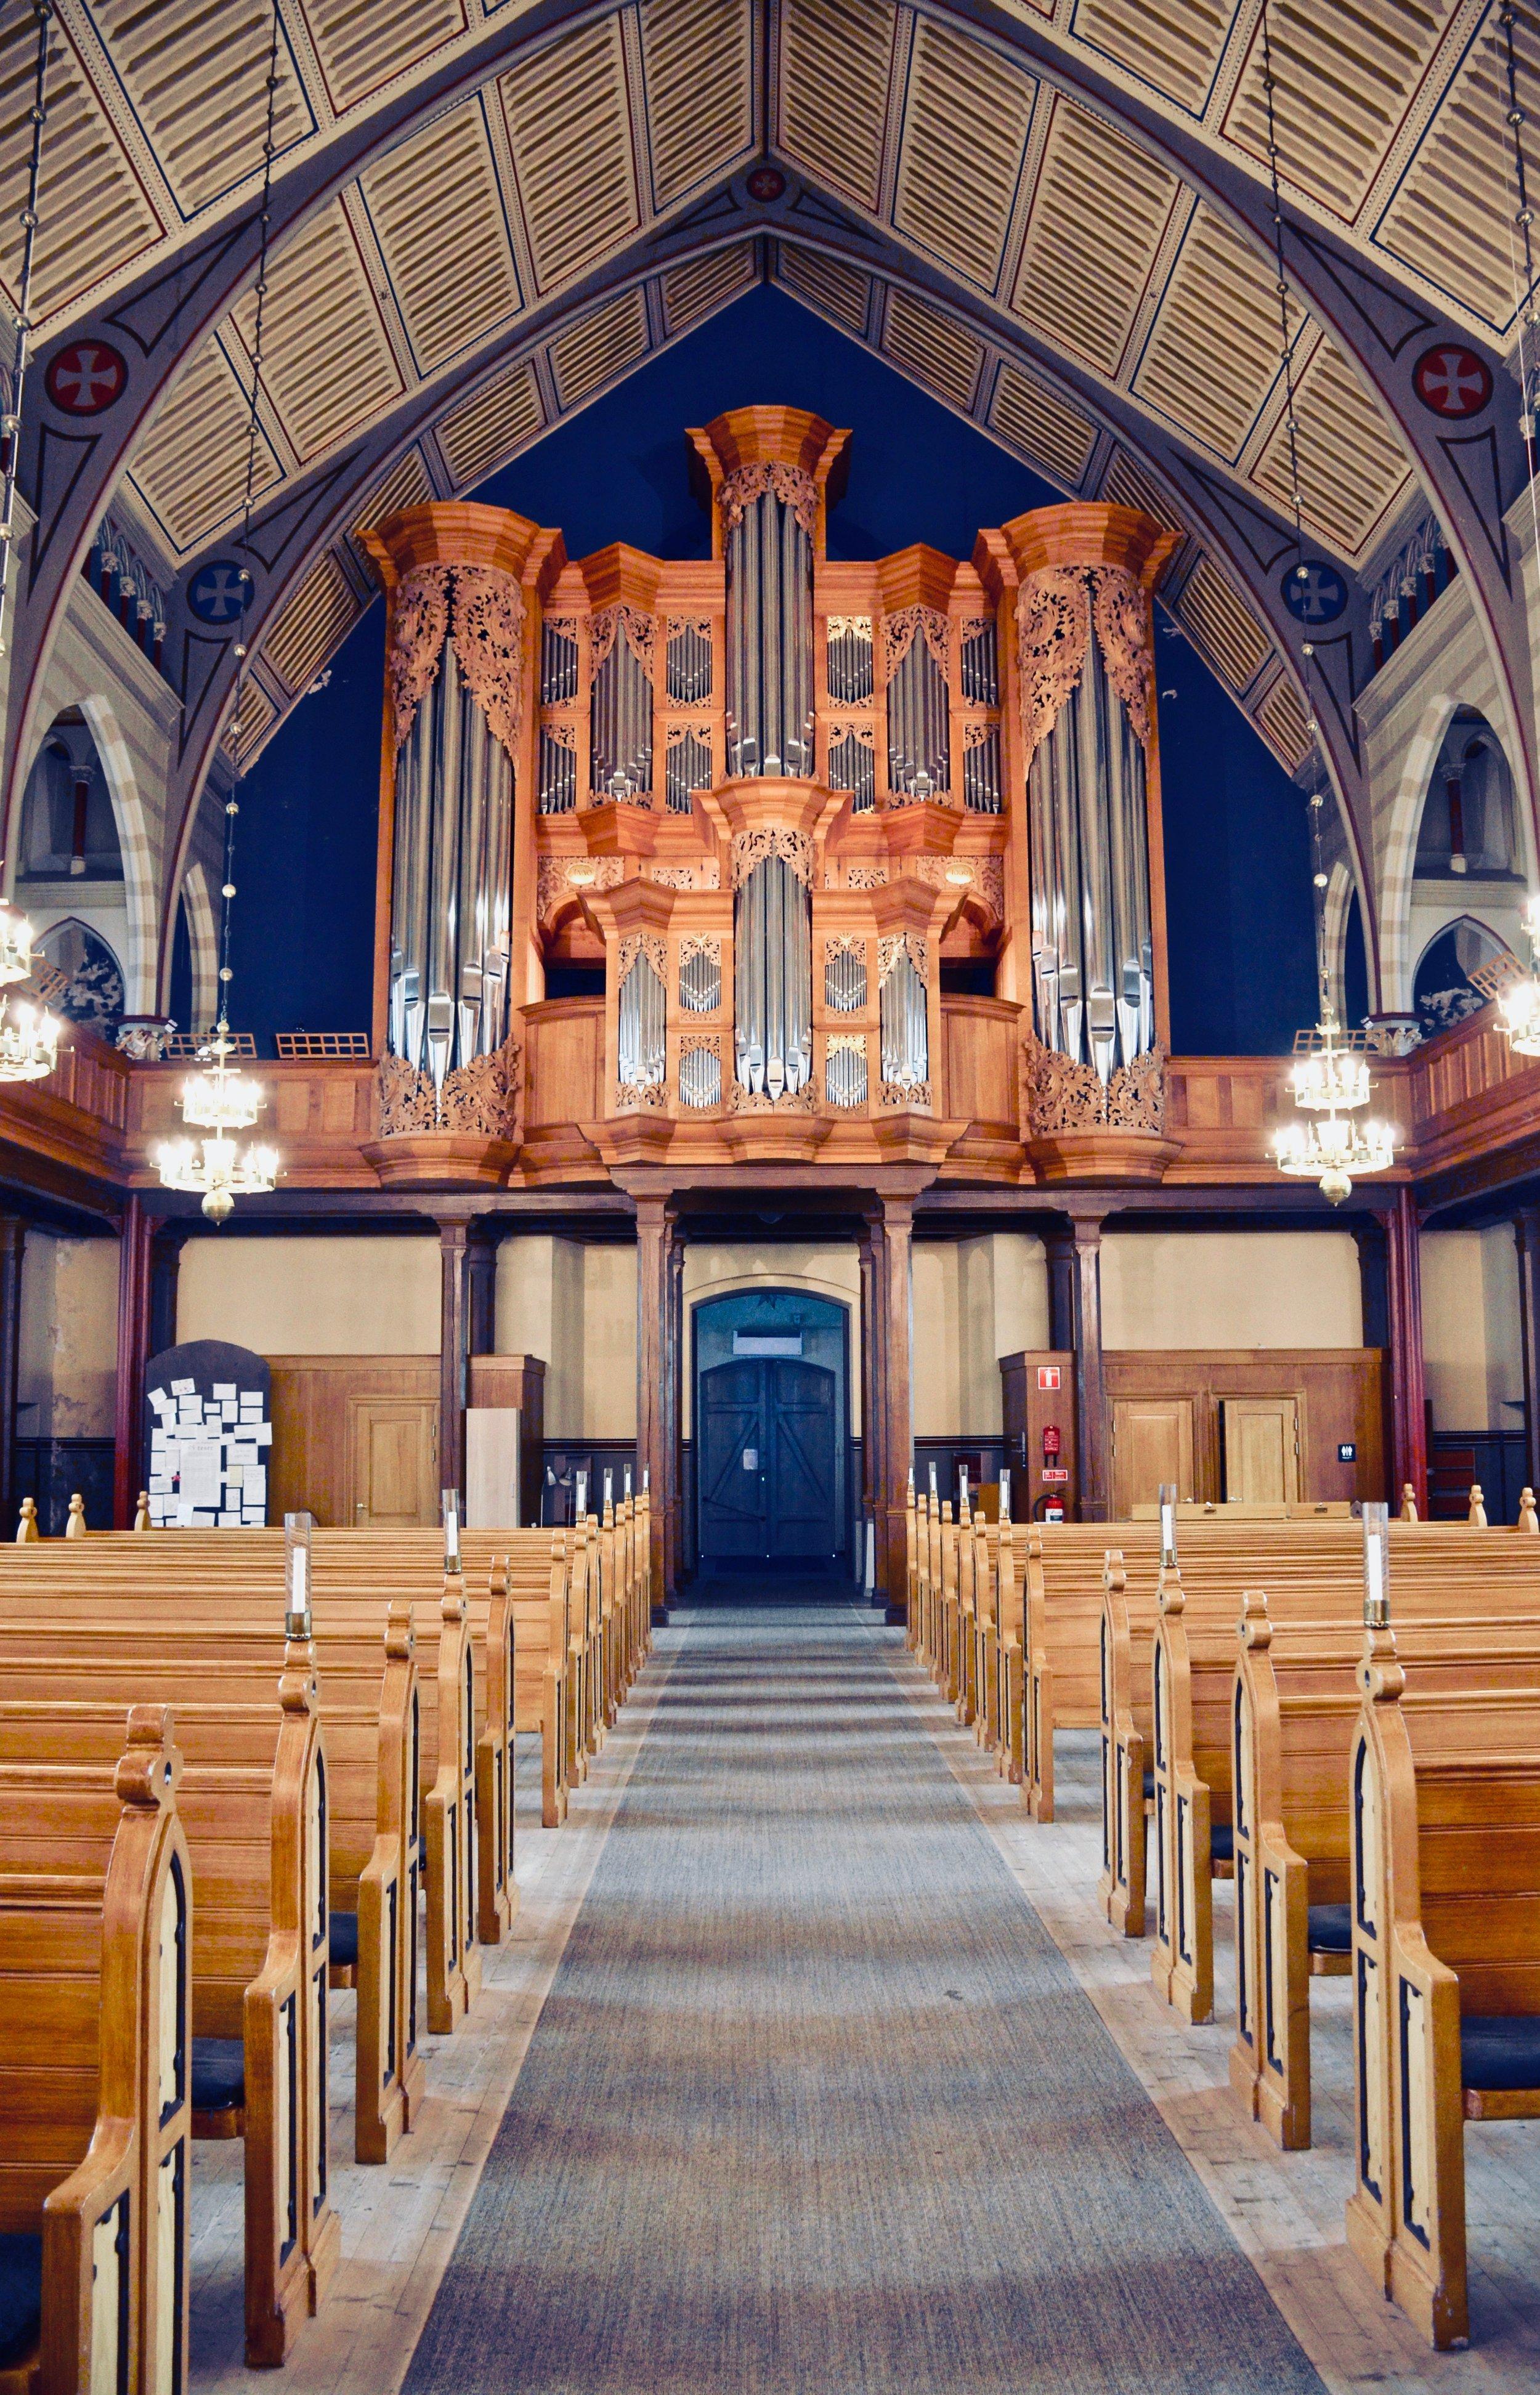 The 2000 GoART research organ in Örgryte New Church, Göteborg, Sweden.